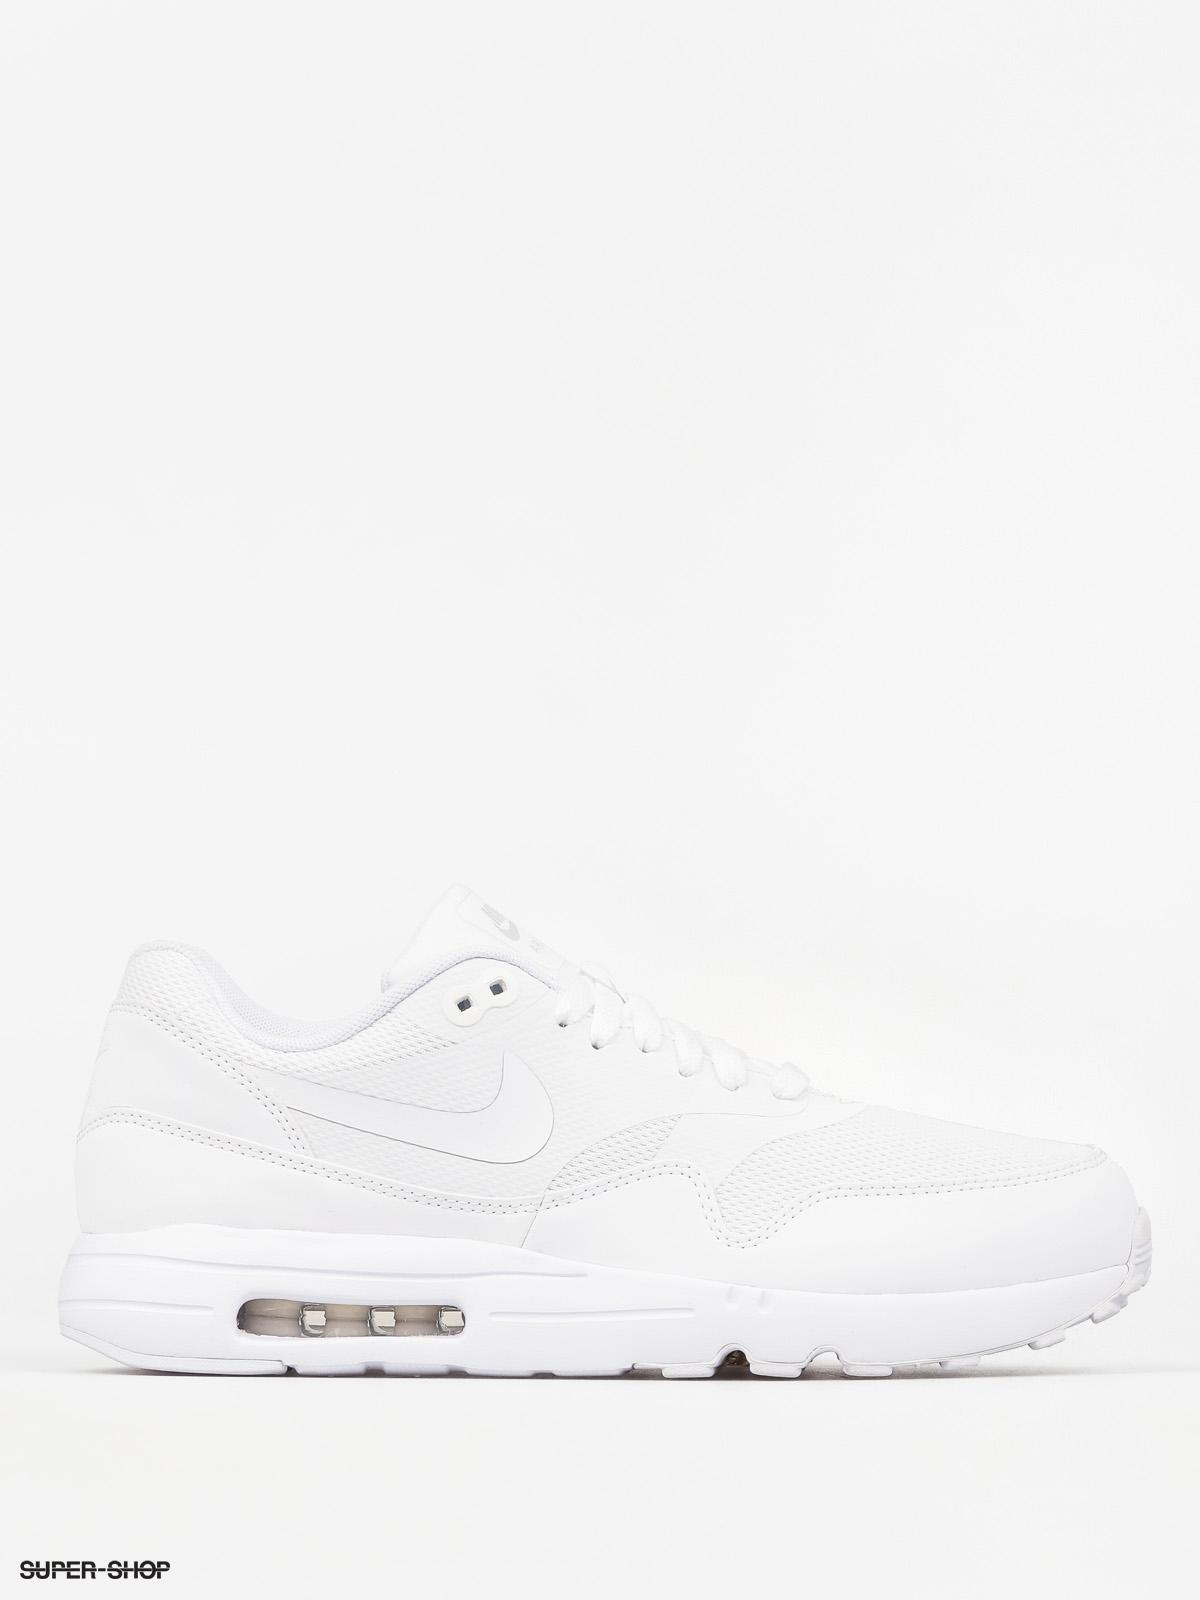 1200x1600 Shoes Air Max 1 (Ultra 2 0 Essential Whitewhite Pure Platinum)